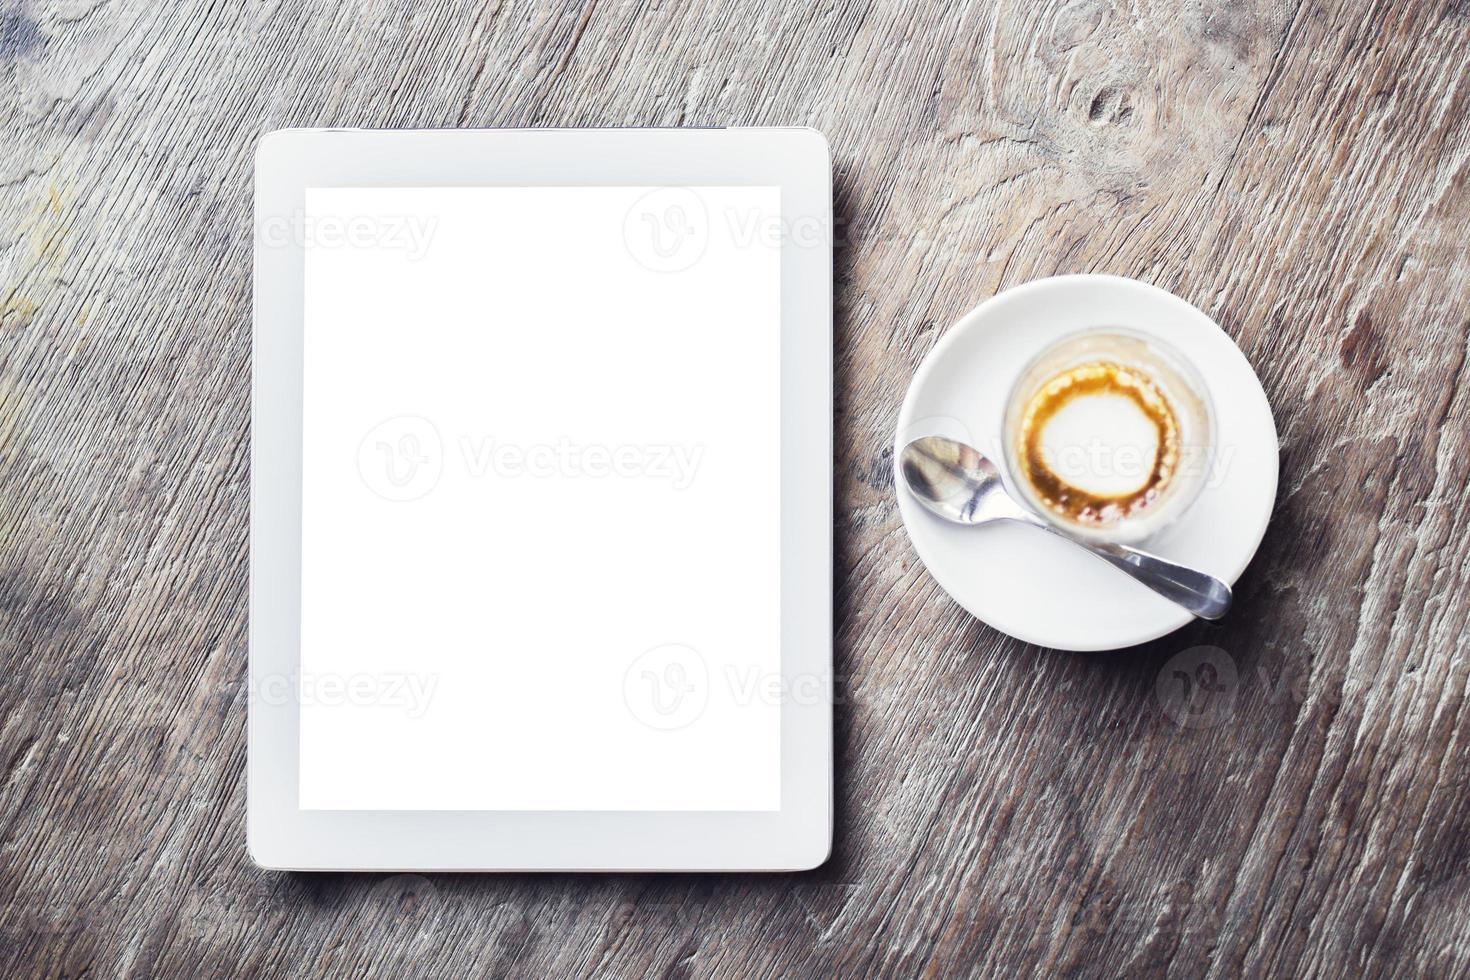 tavoletta digitale vuota con una tazza di caffè foto